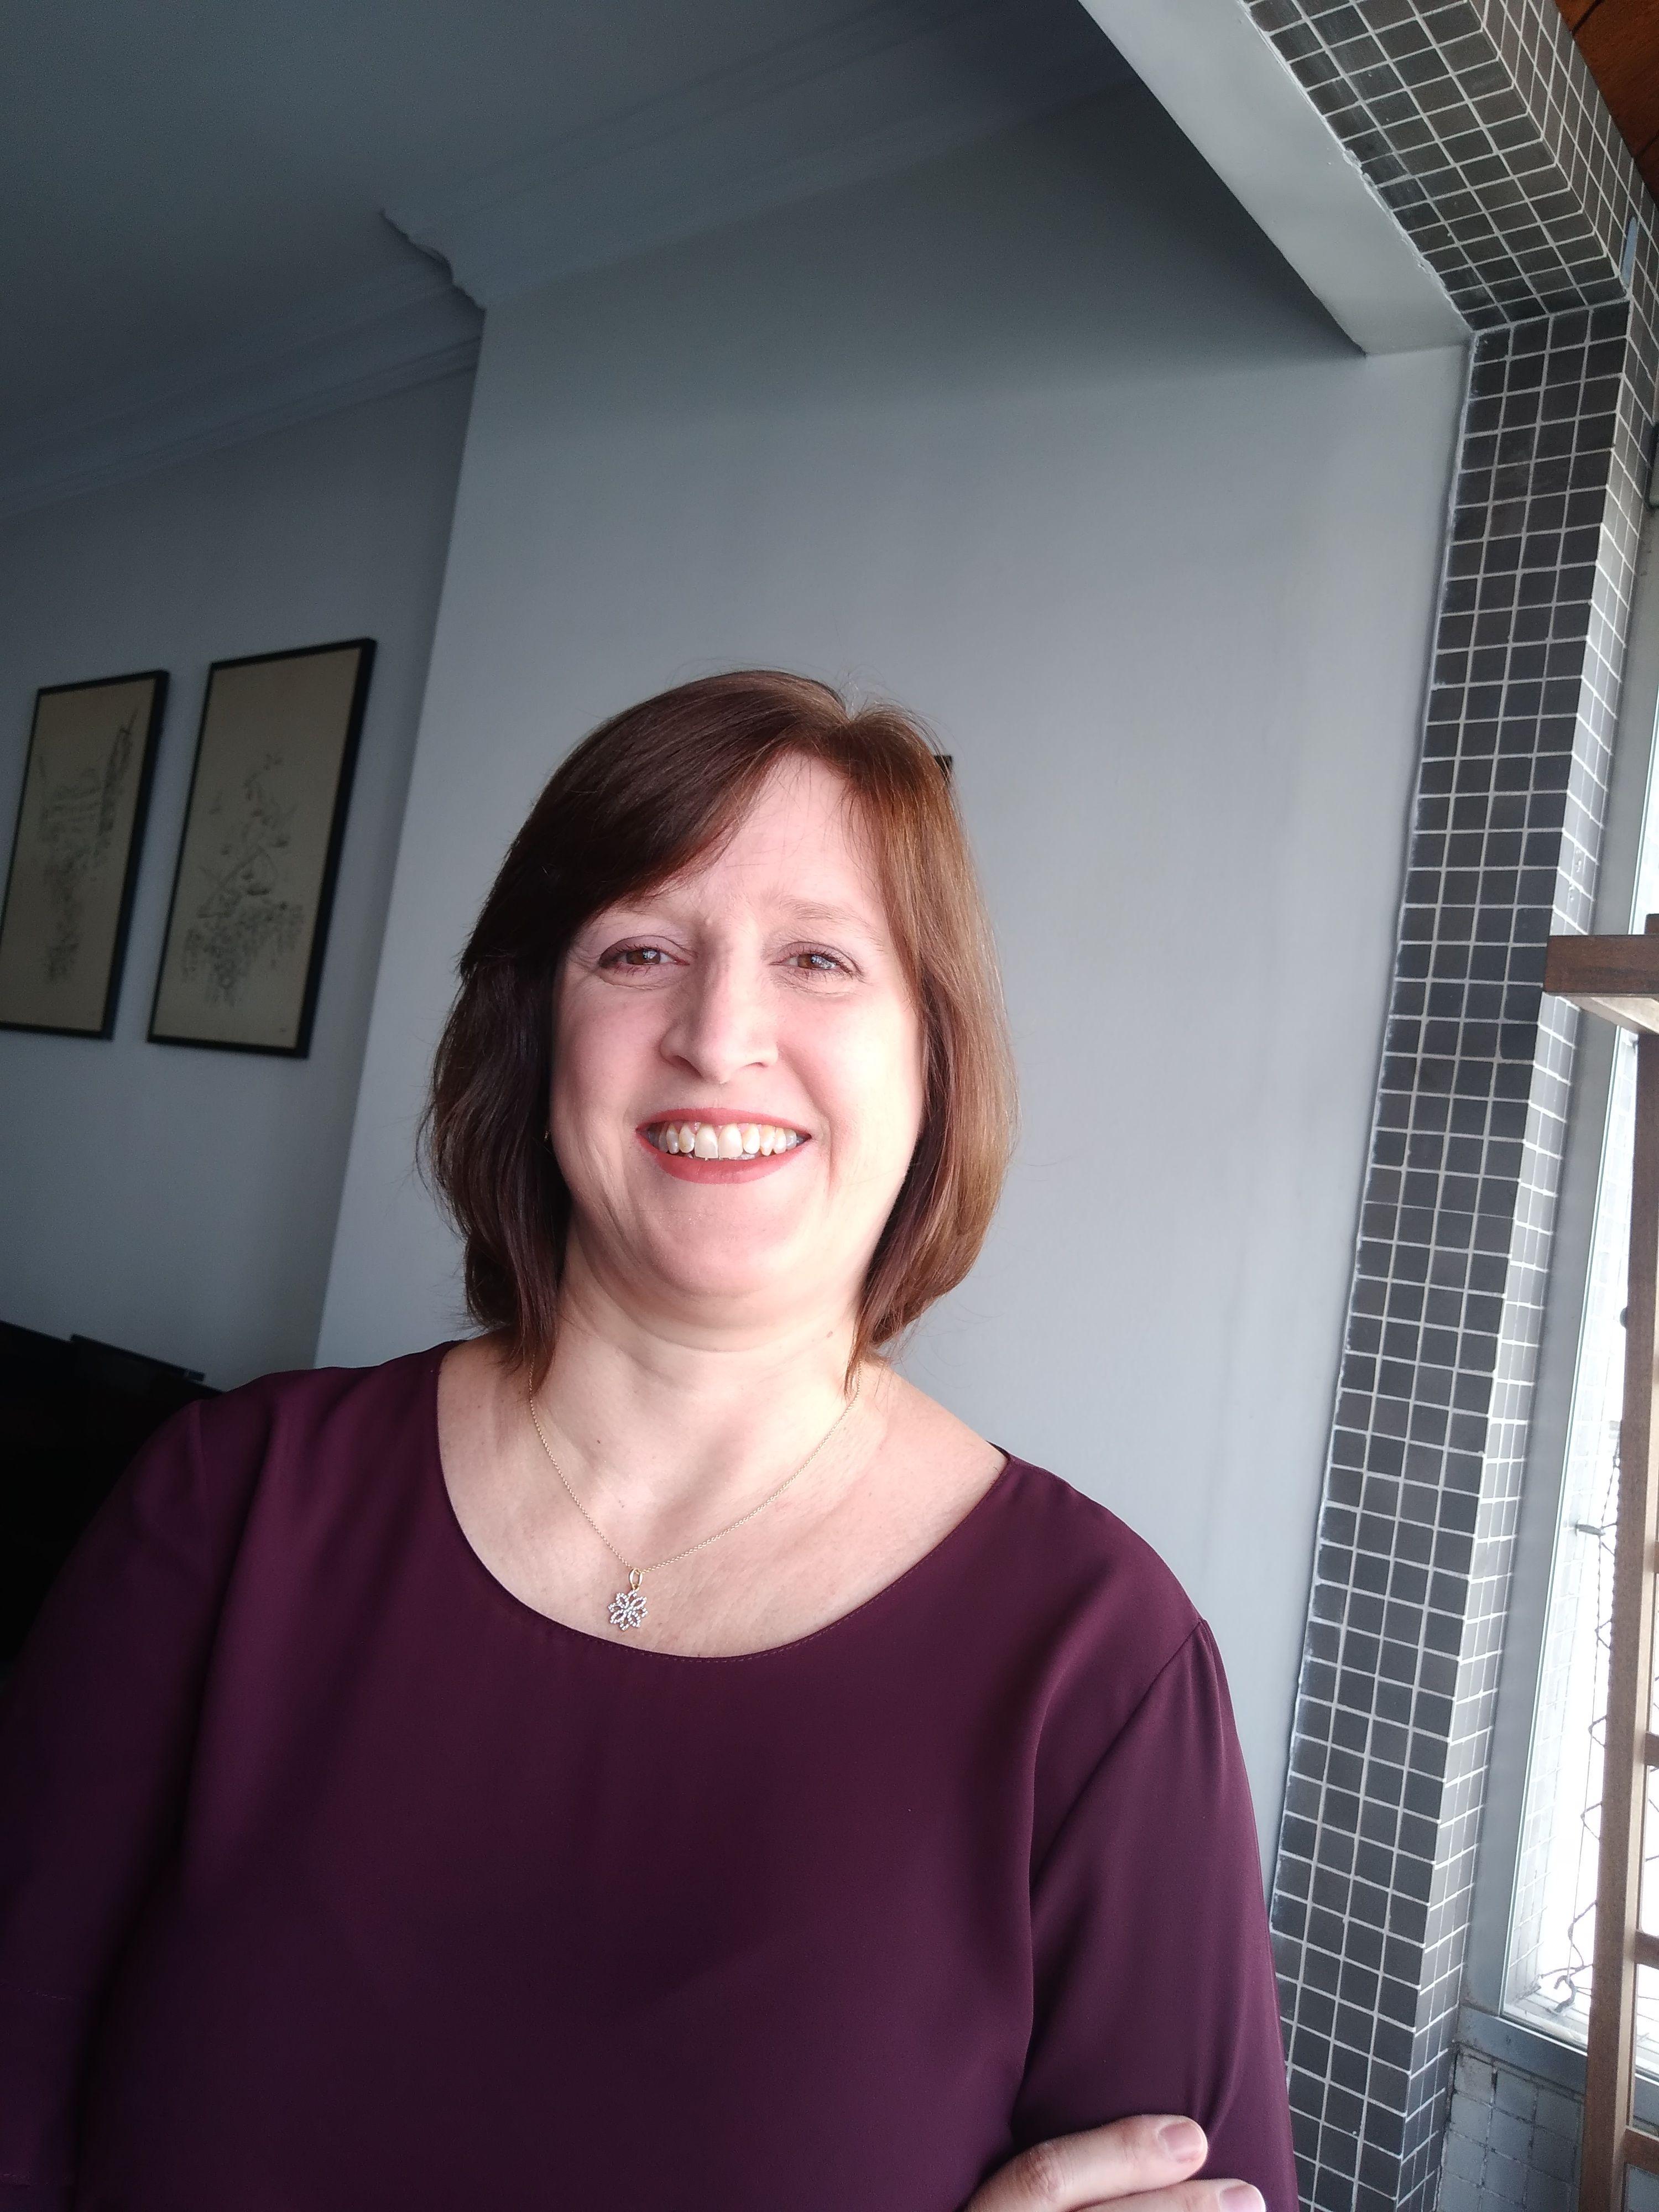 Betina Von Staa